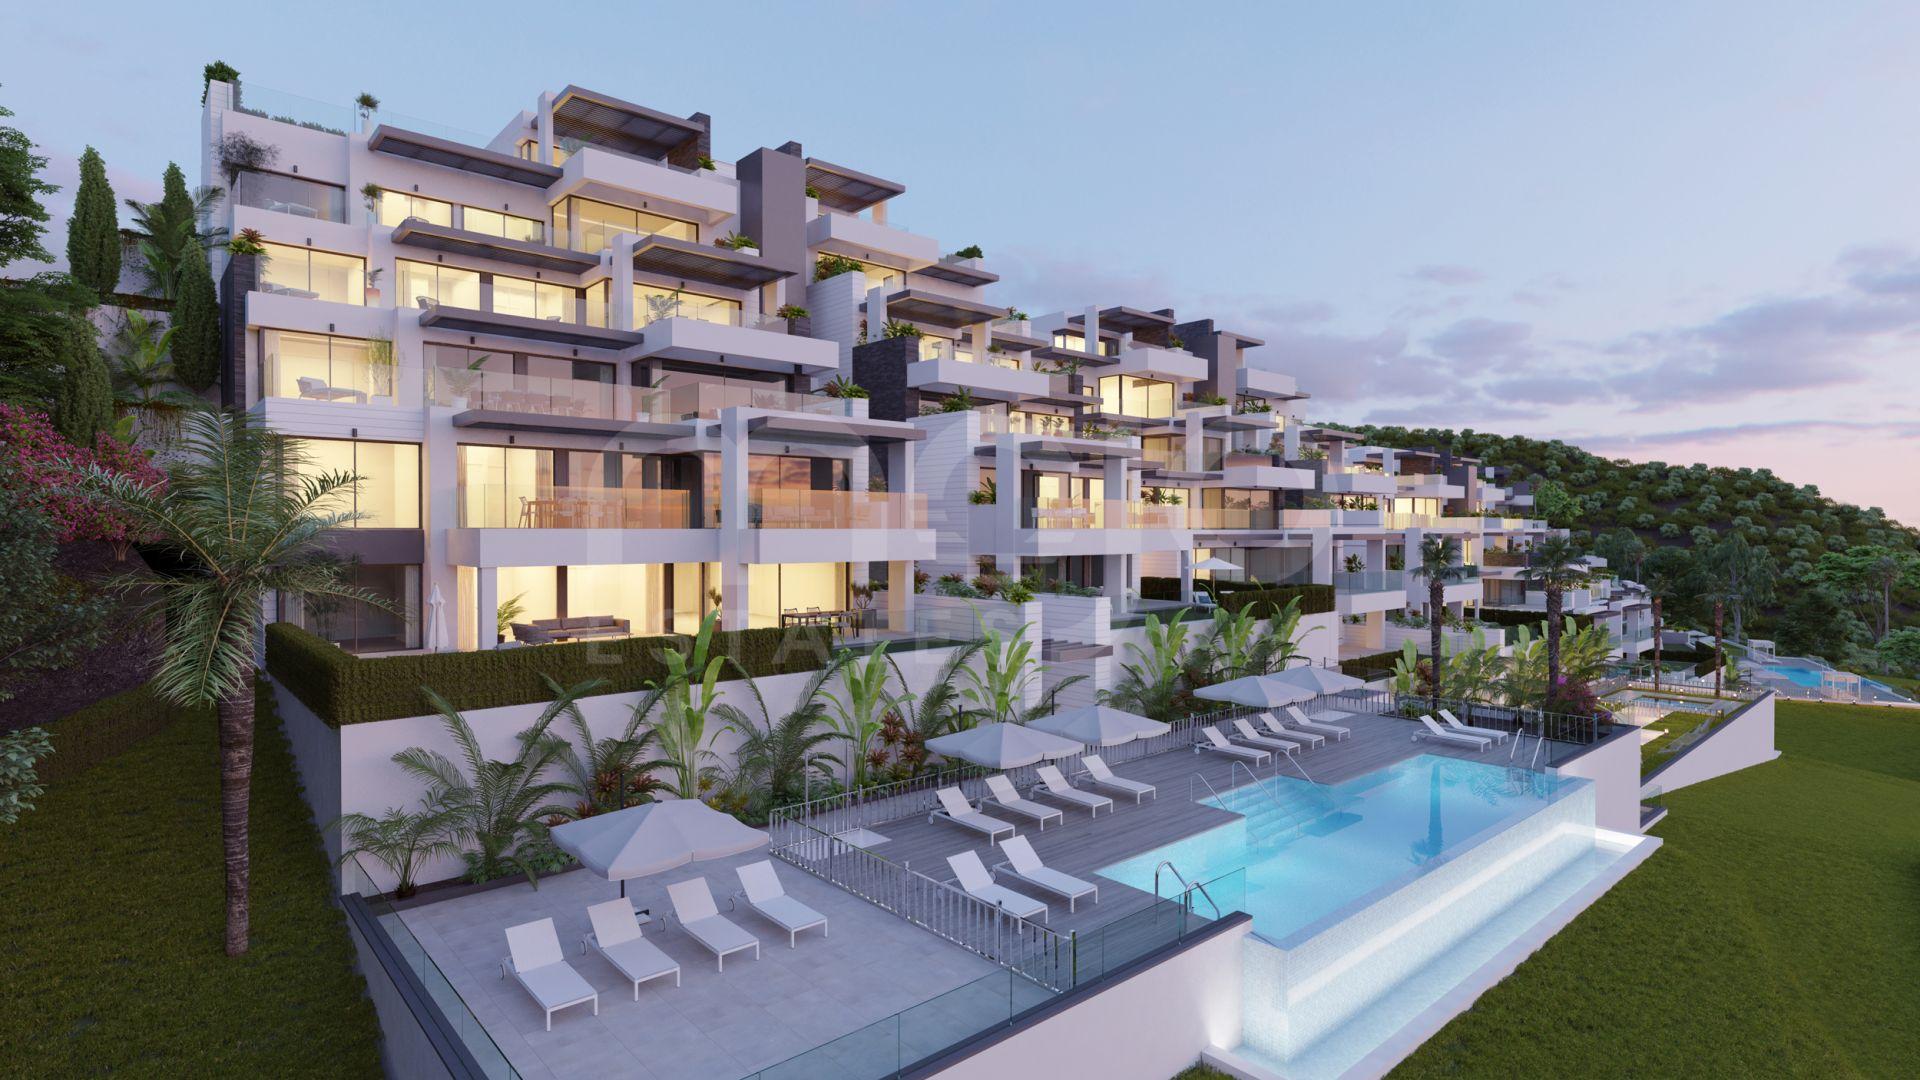 Aqualina Residences & Collection, luxury lifestyle in the privileged area of Las Colinas de Marbella in Benahavis